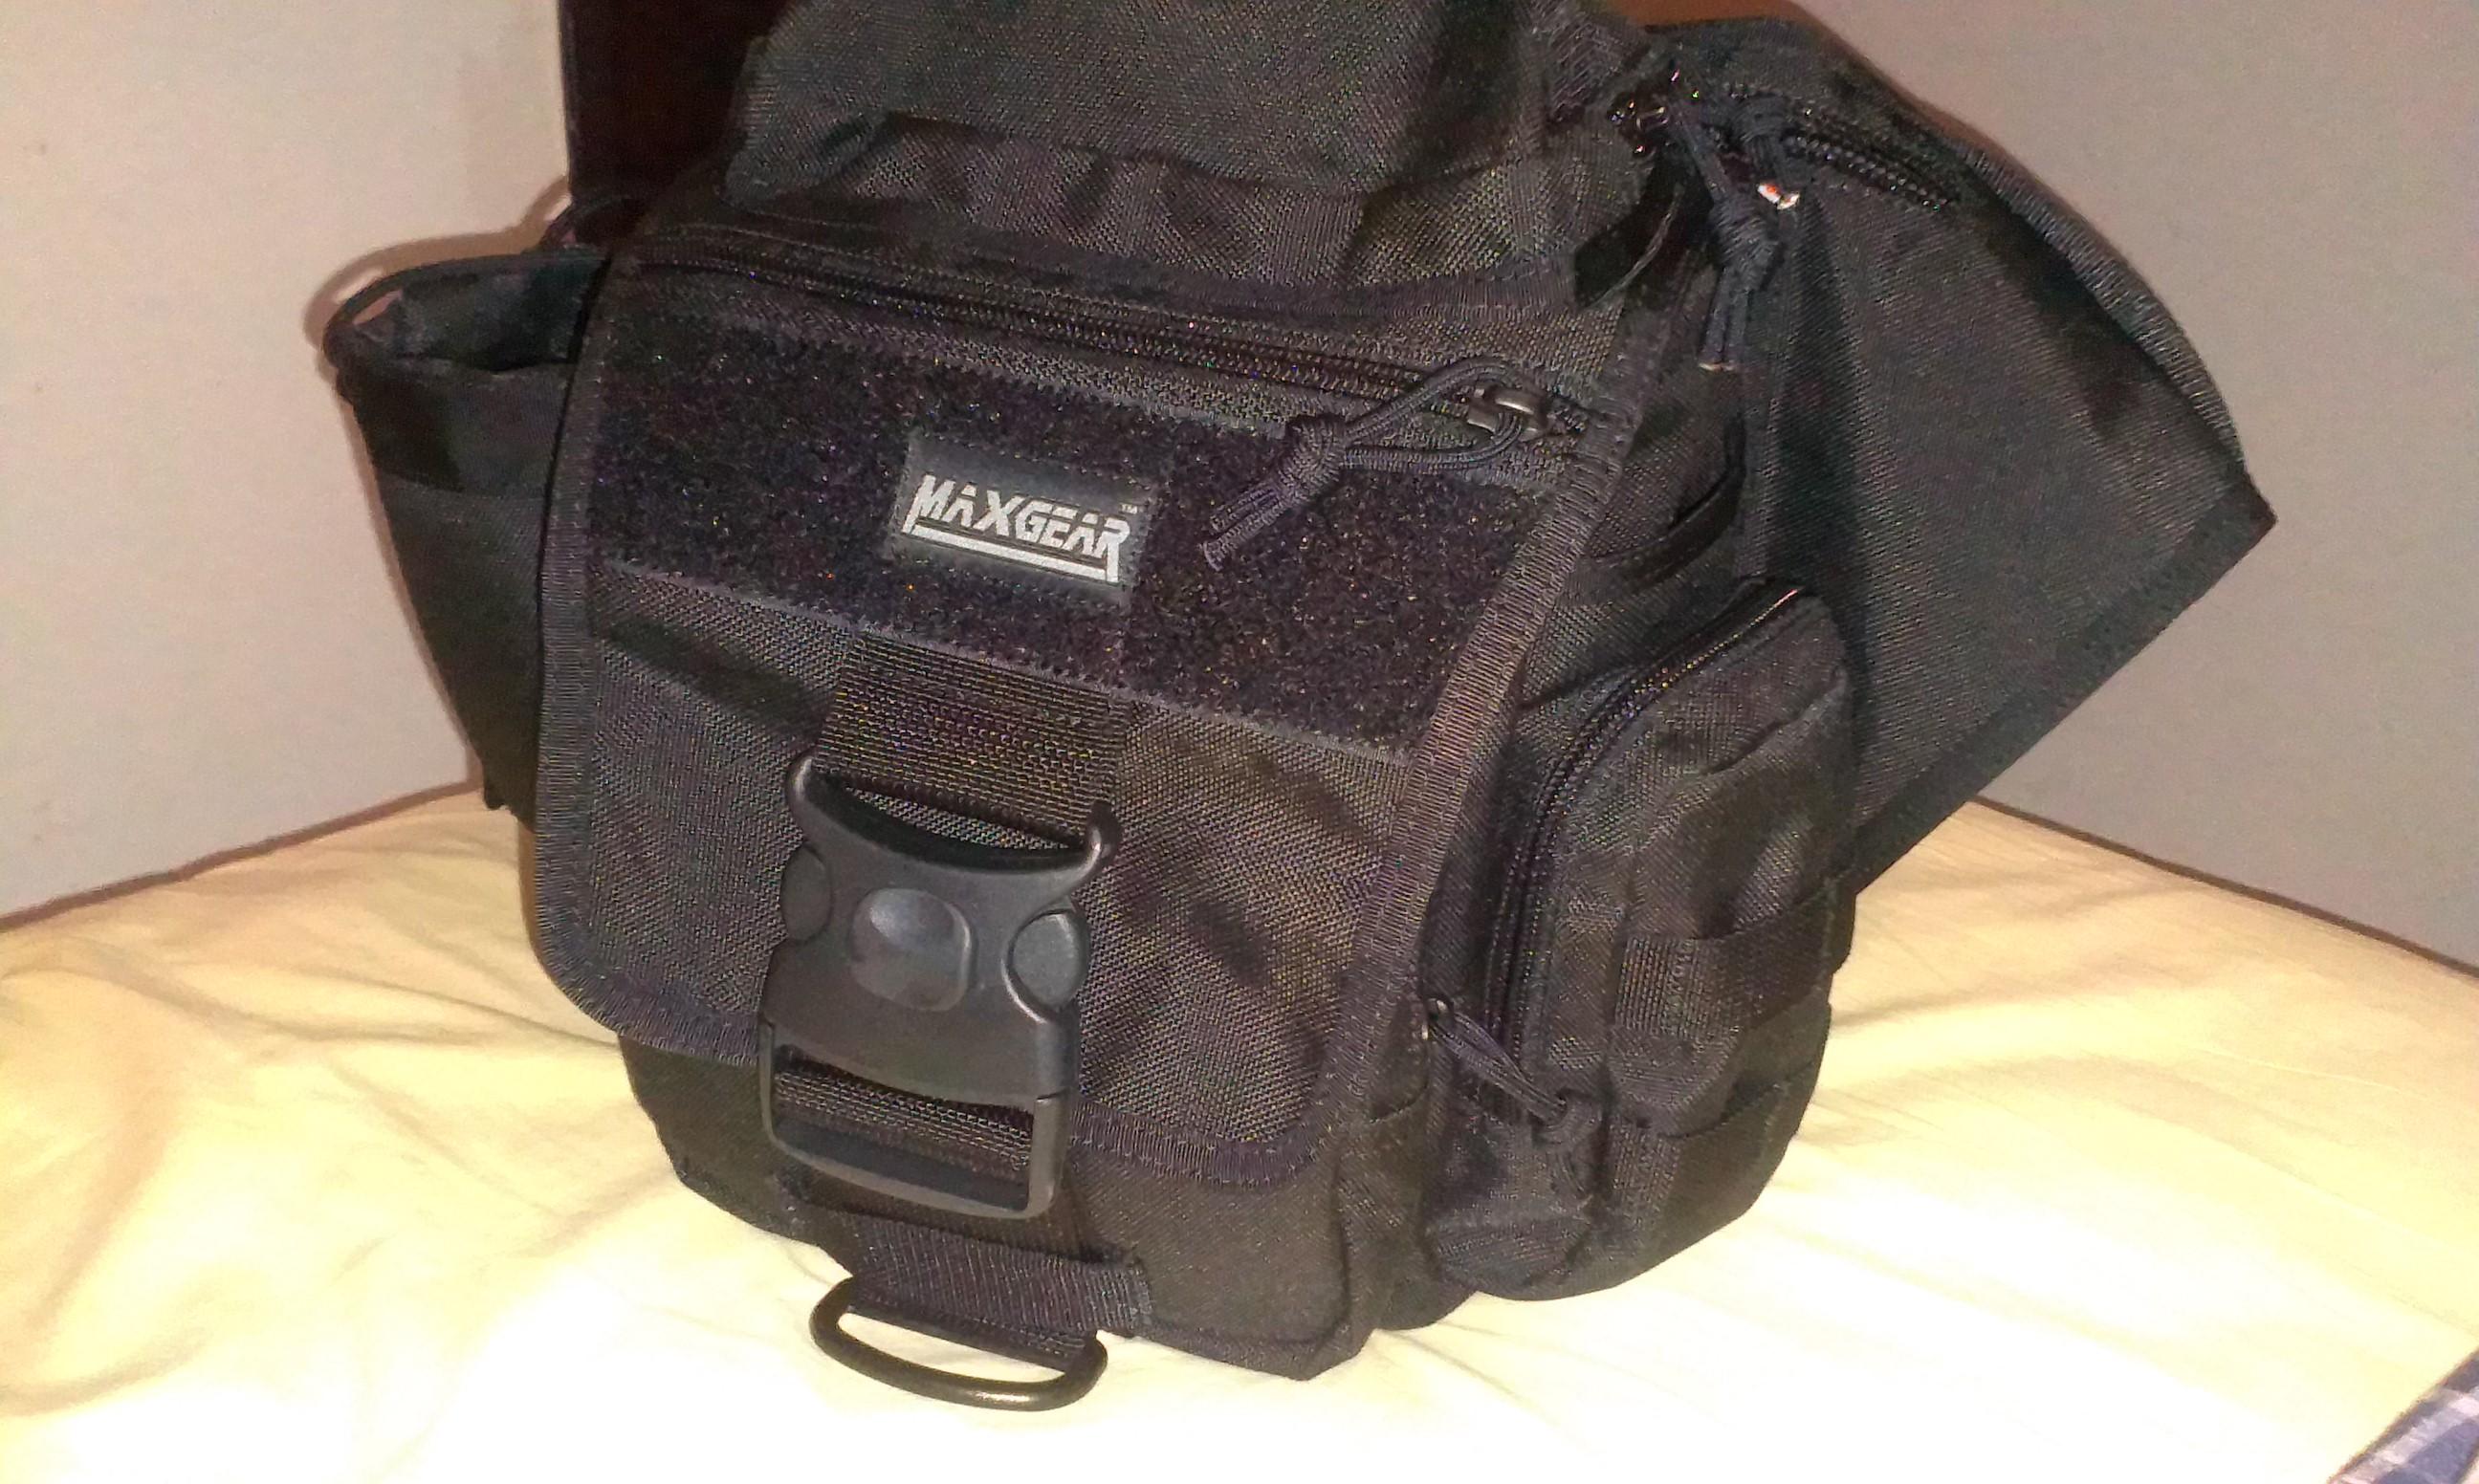 small messenger bag for women 00263001 bags